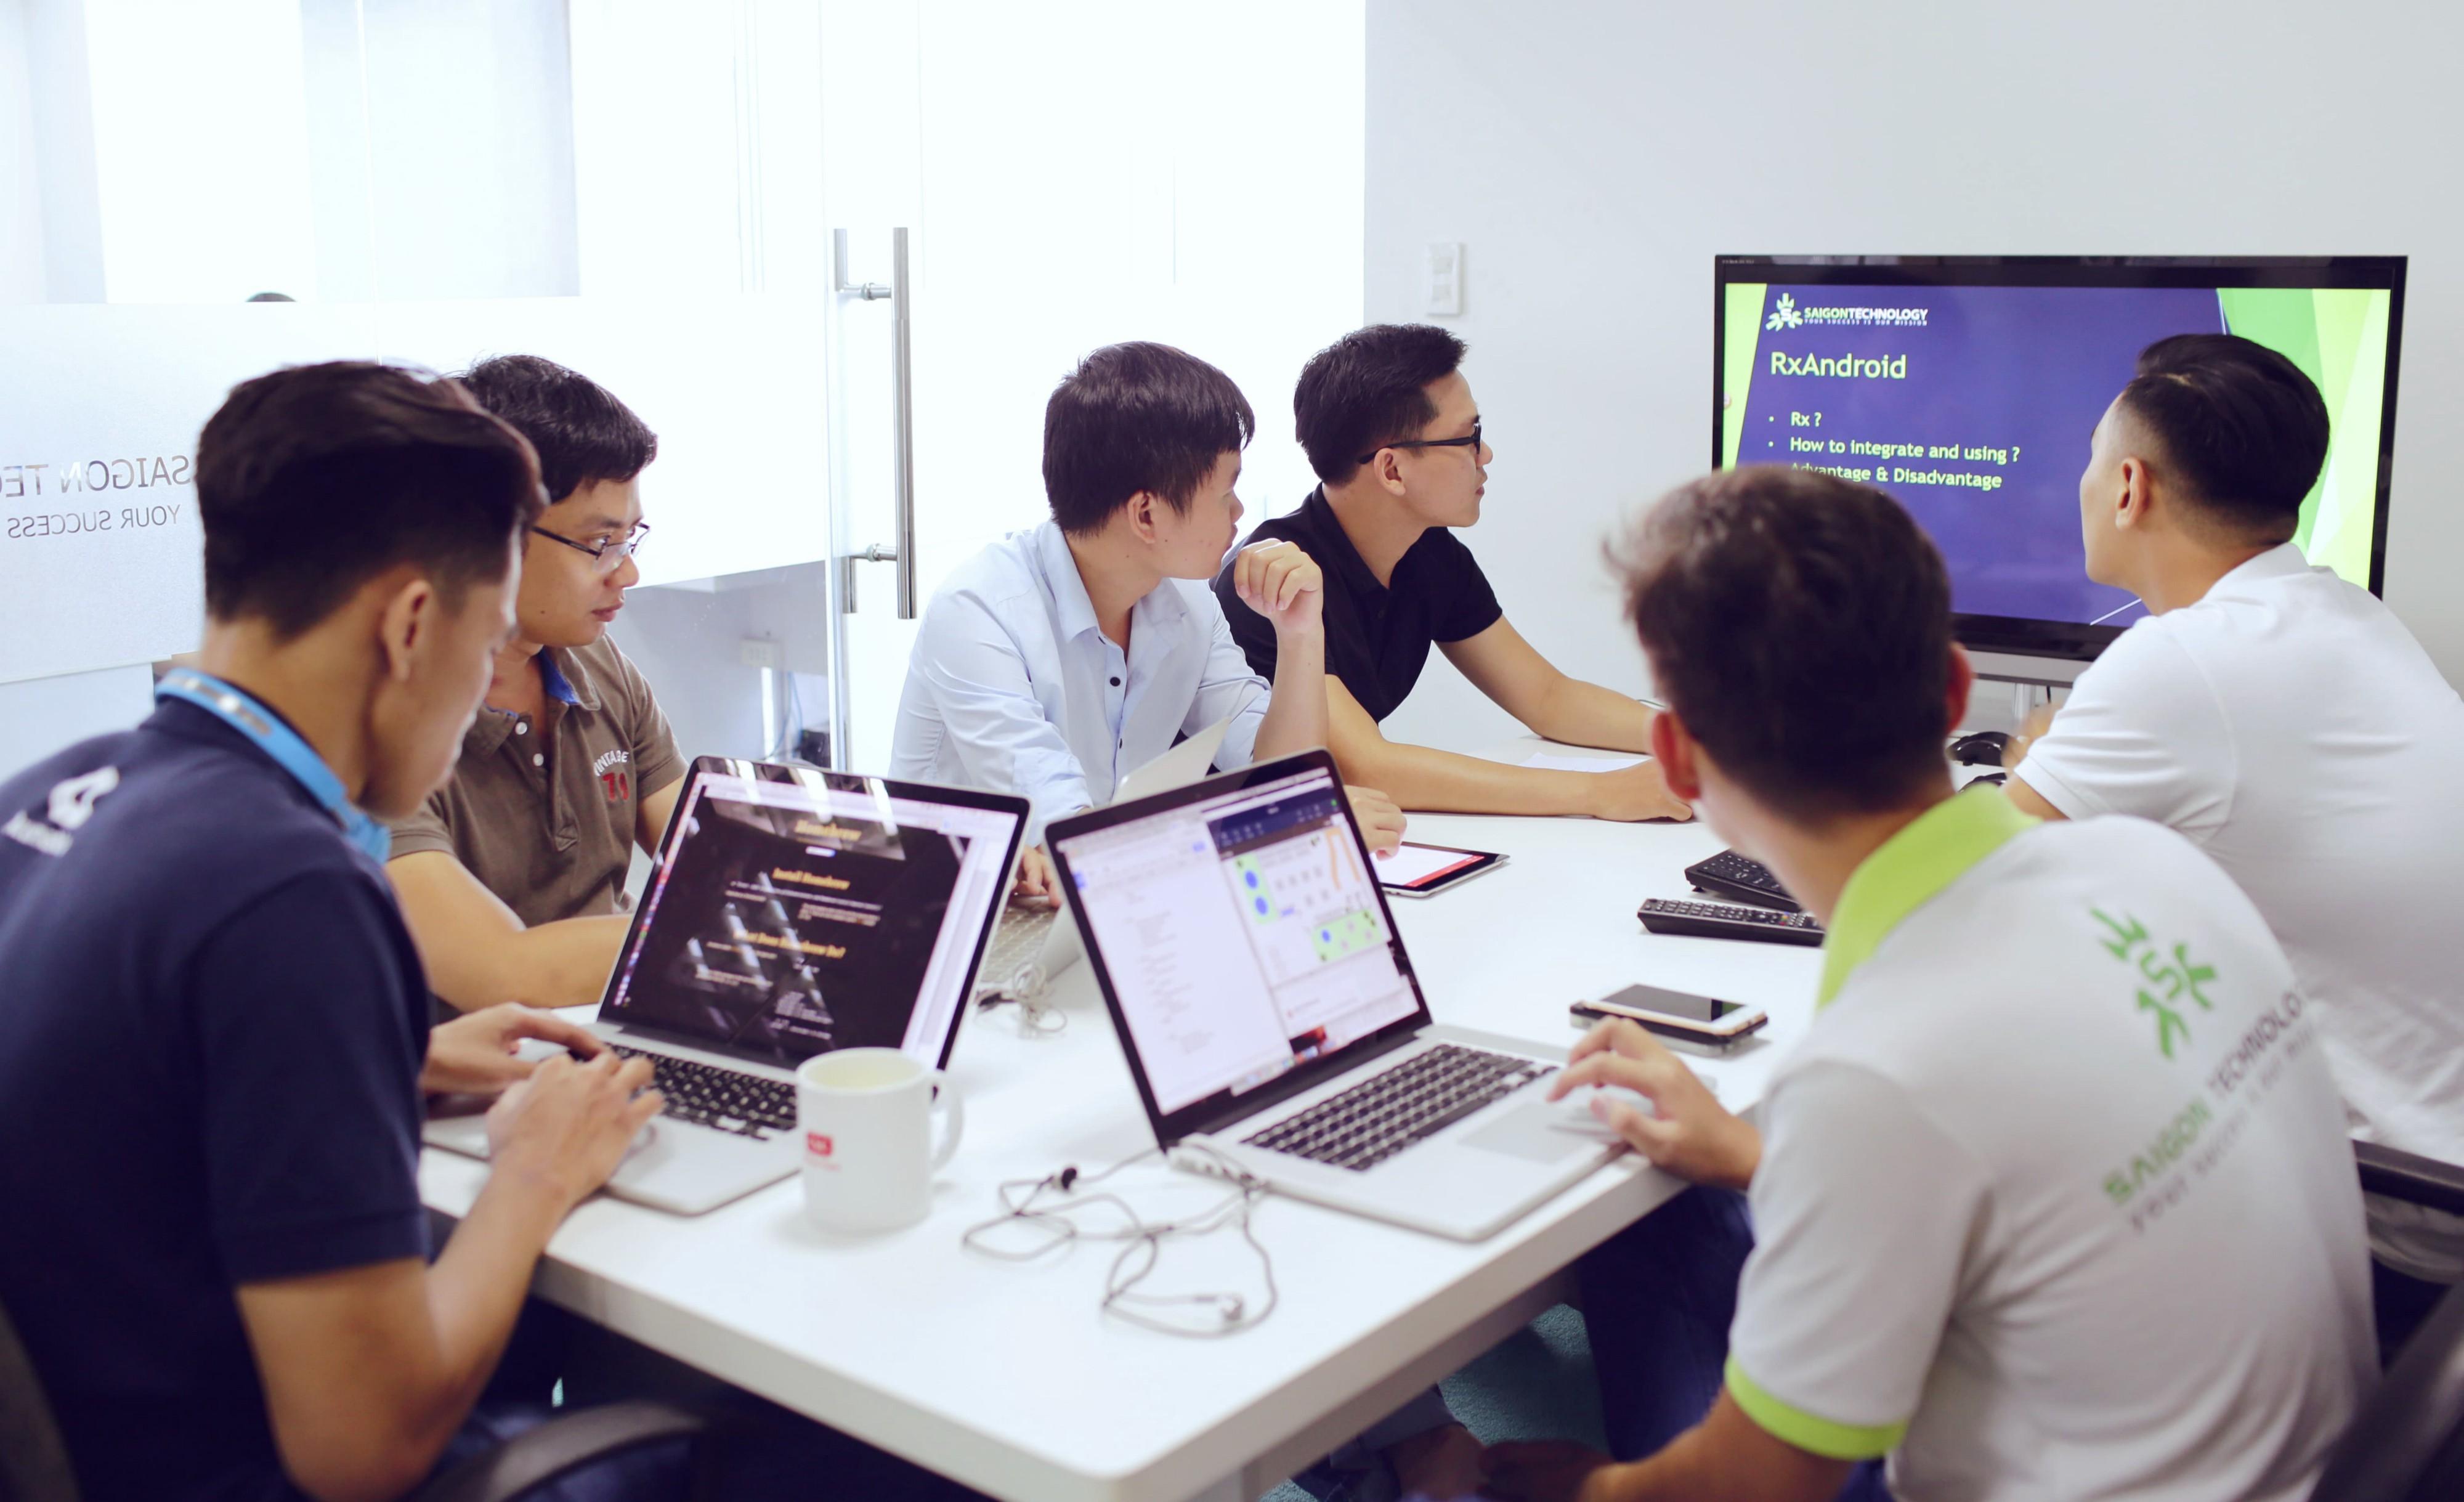 Tips to Build an Effective Software Development Team